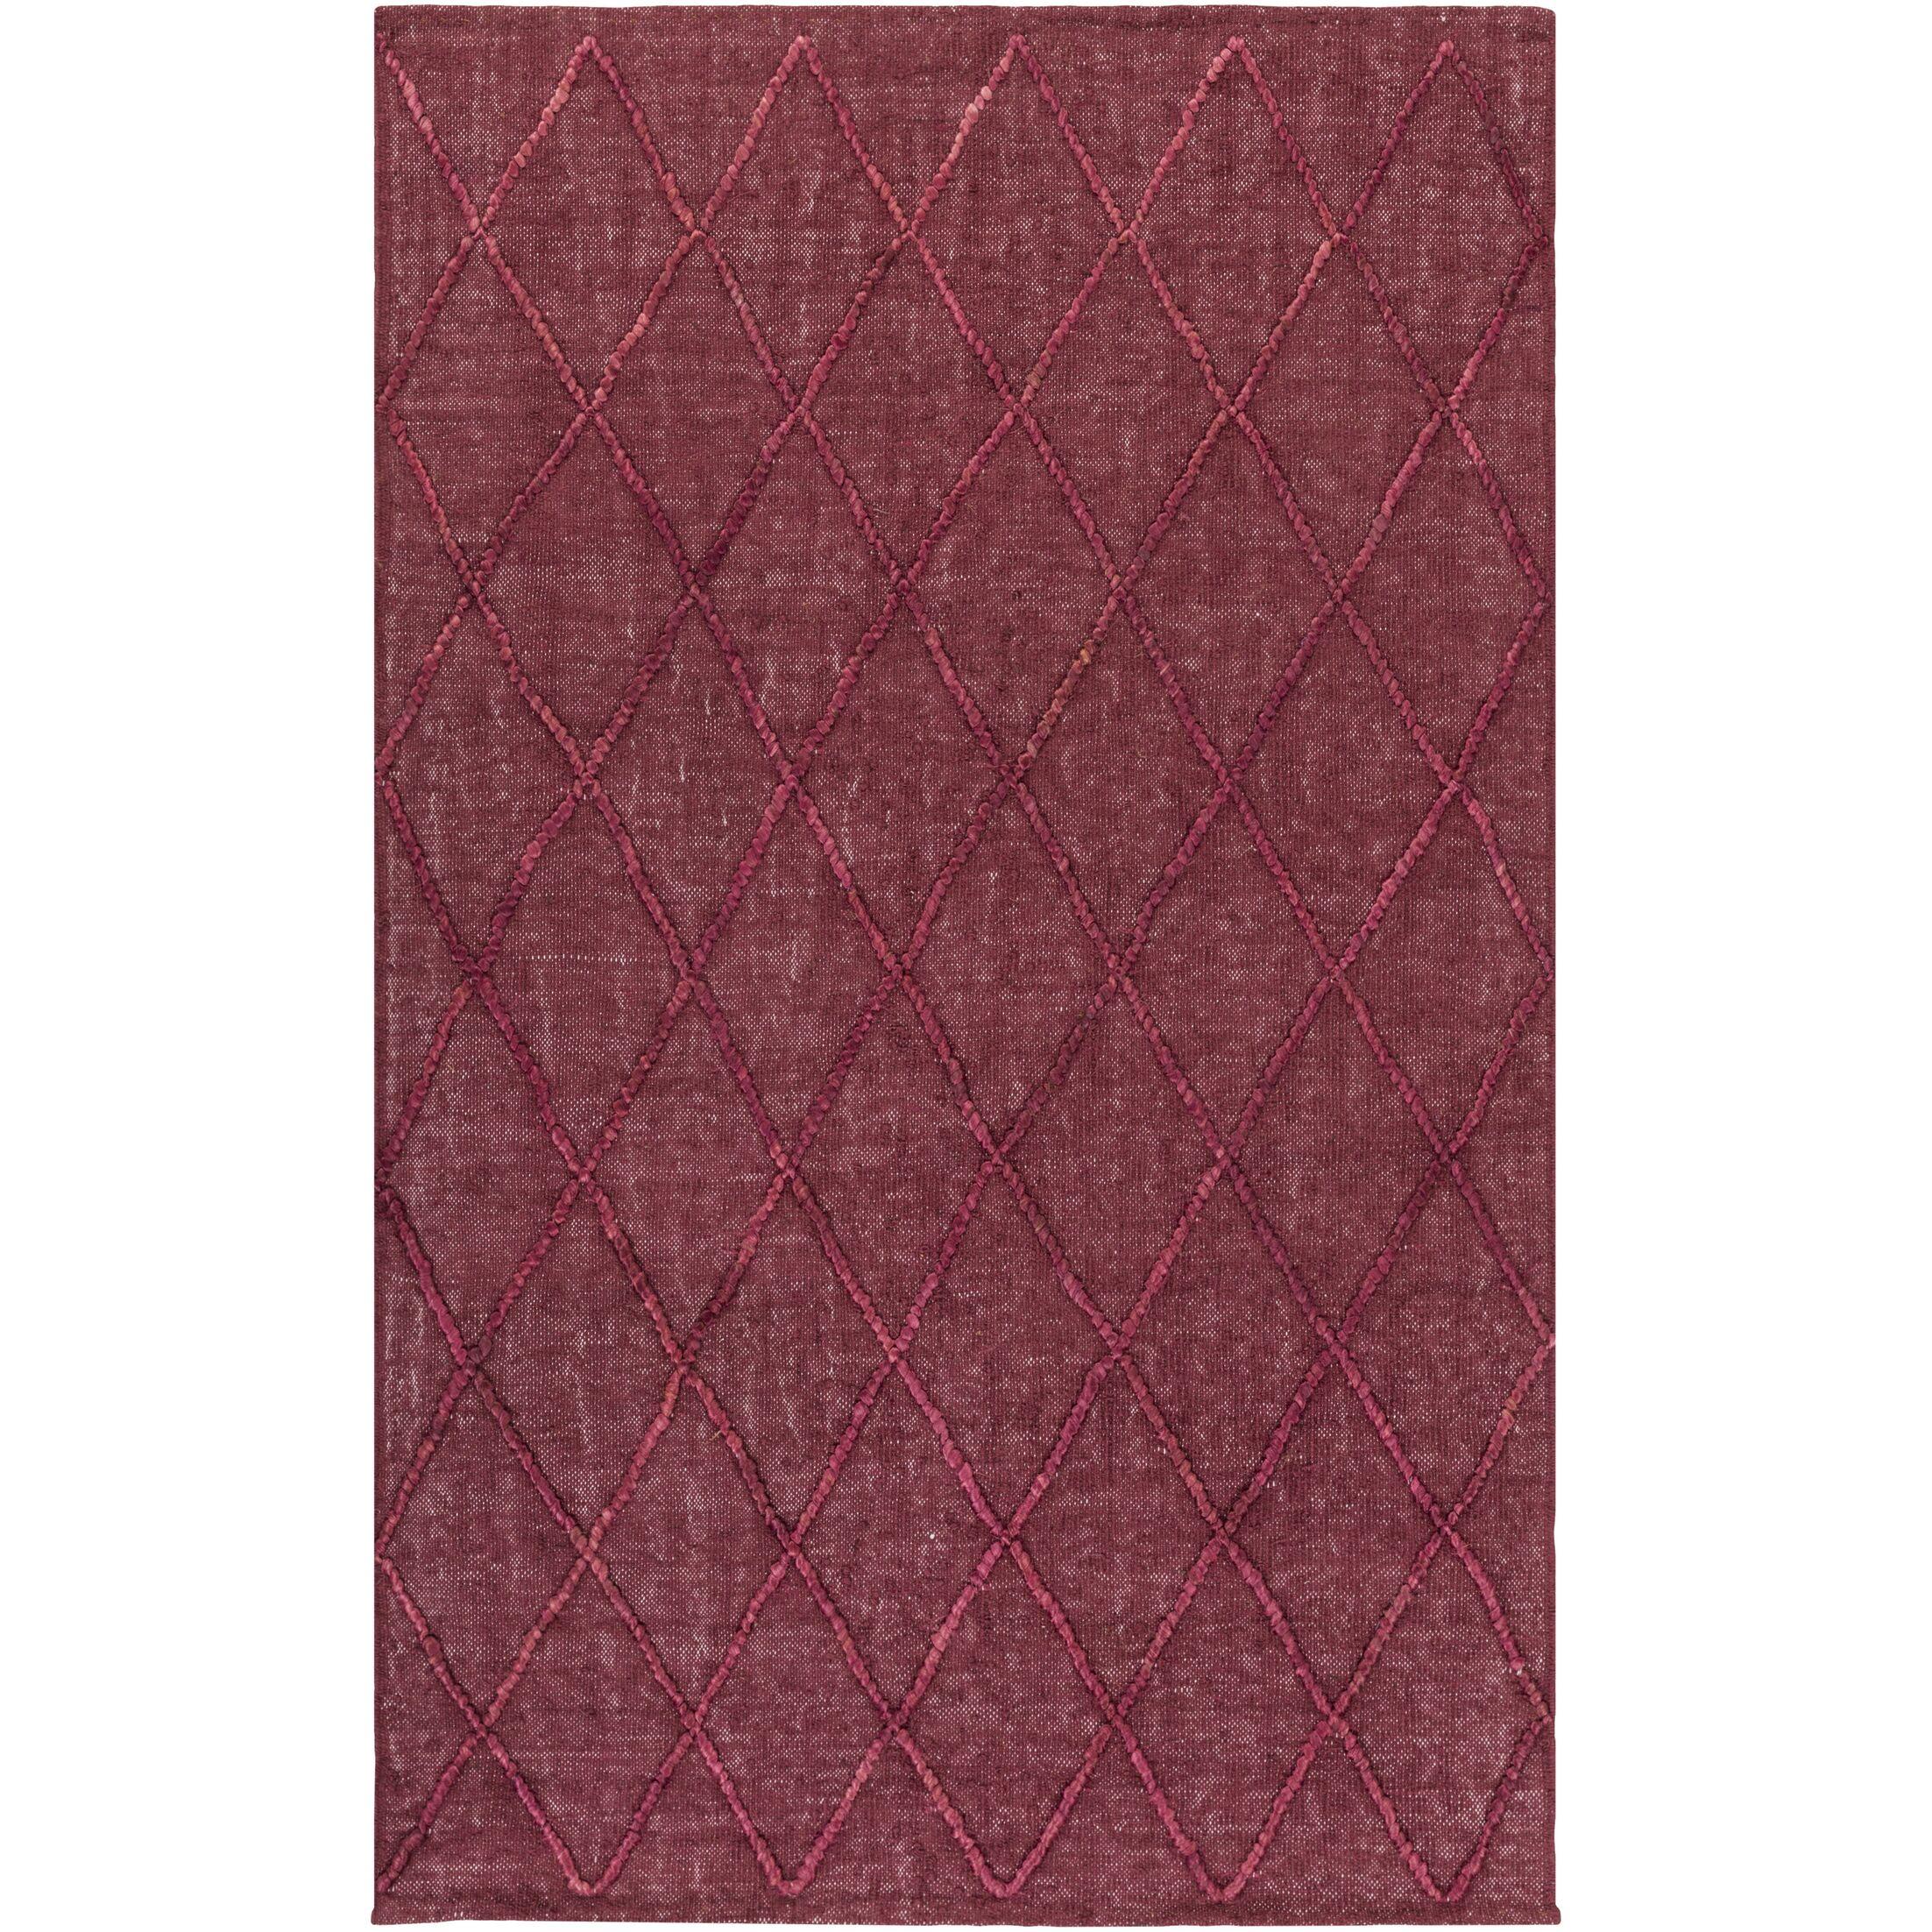 Rachelle Hand-Woven Burgundy/Garnet Area Rug Rug Size: Rectangle 6' x 9'